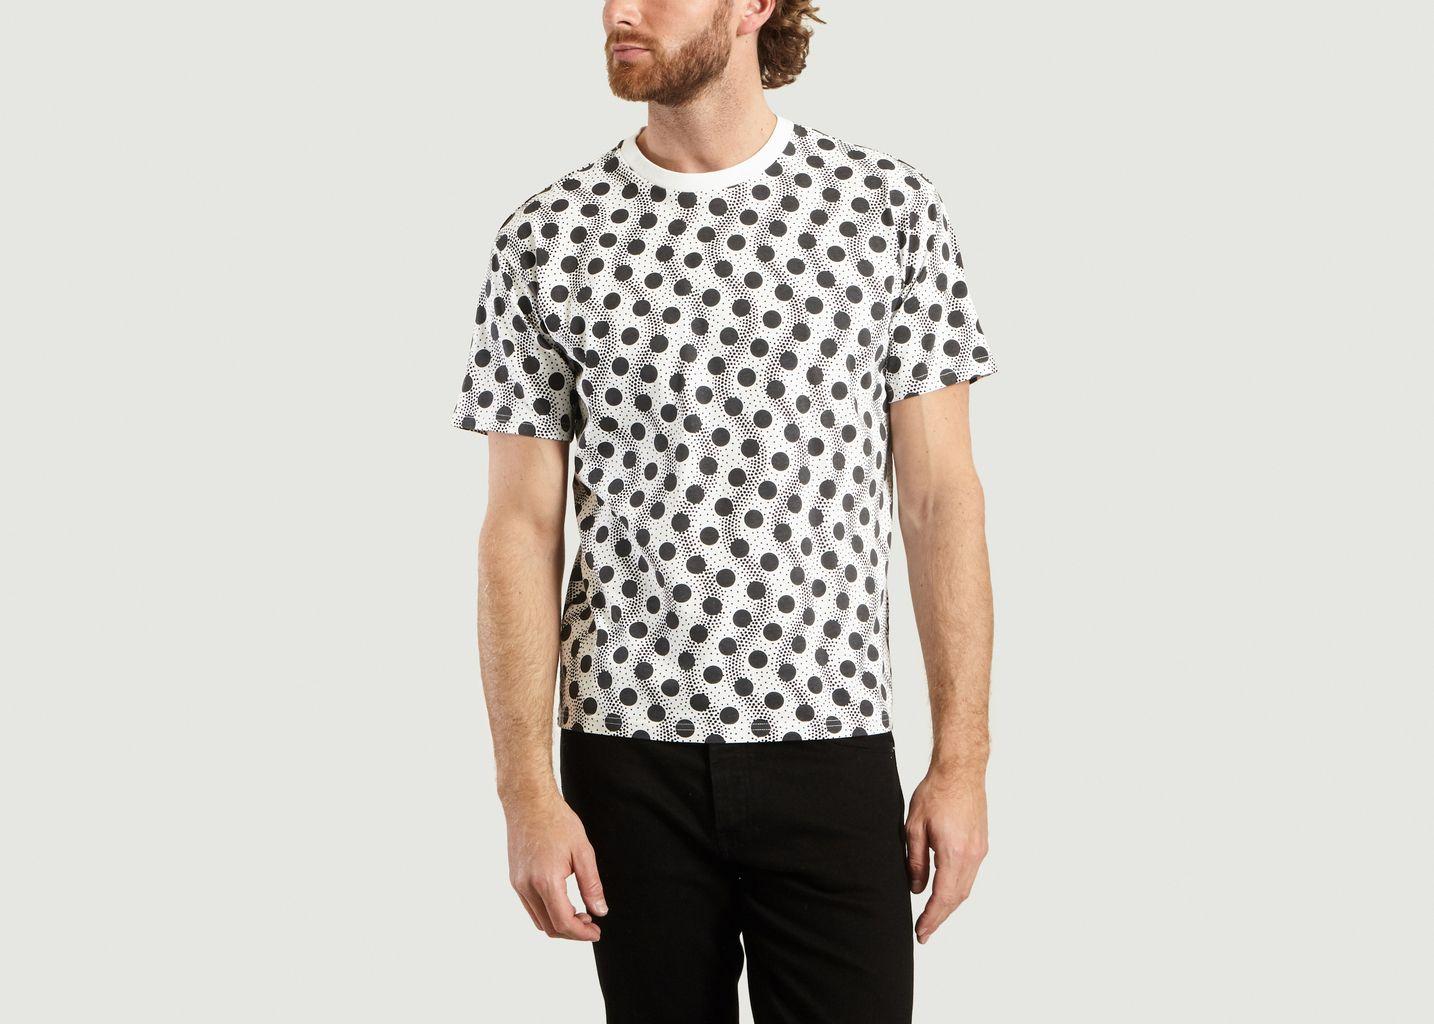 ddcb08b113 Wavy Dots T-Shirt